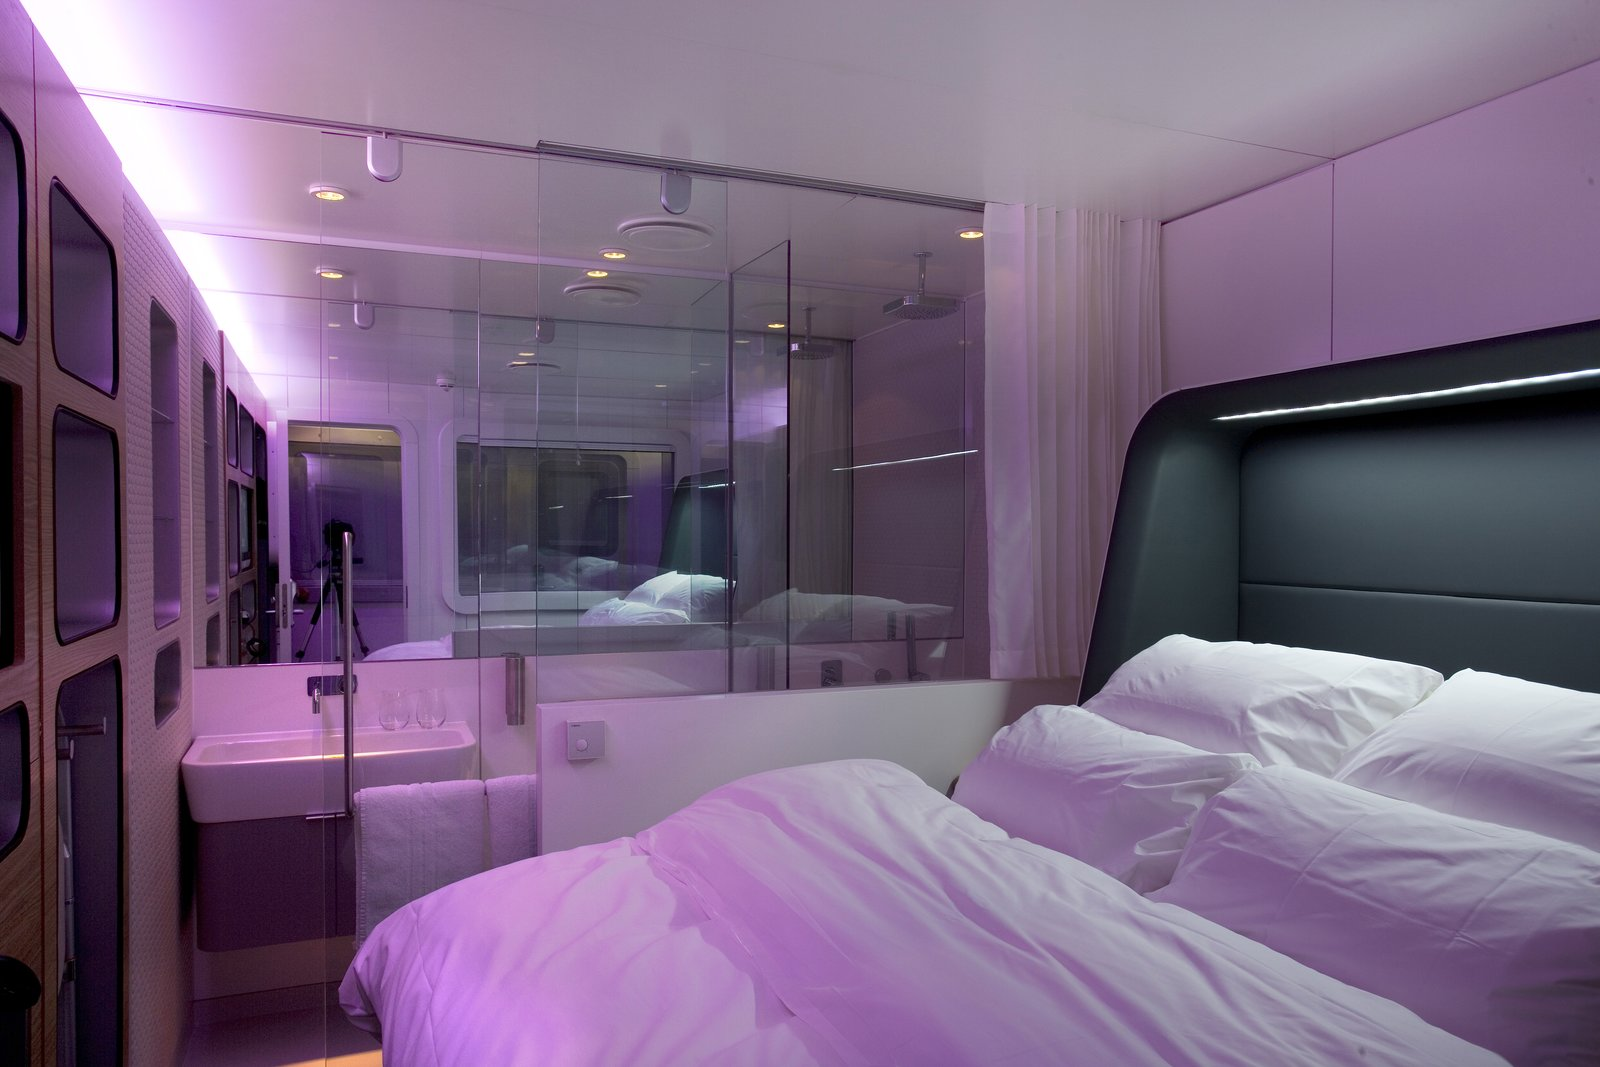 Bedroom, Bed, Storage, Shelves, Ceiling Lighting, Wall Lighting, and Wardrobe  Yotel